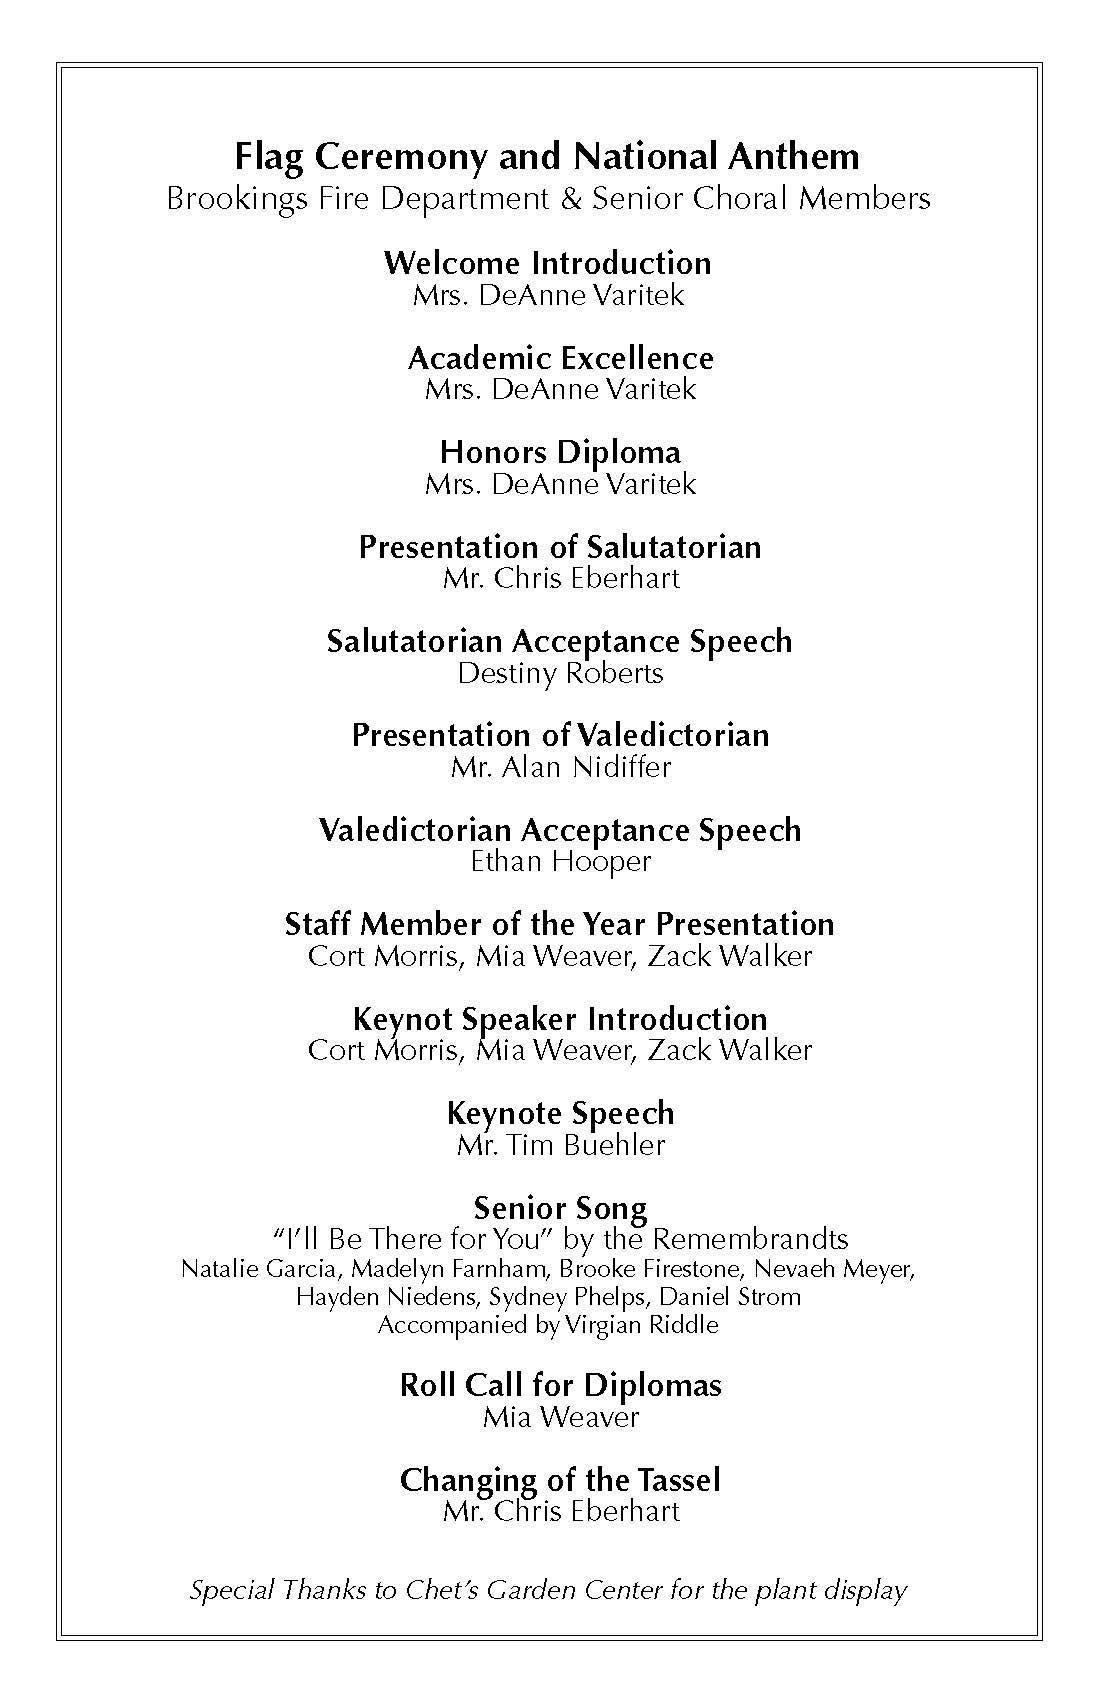 BHHS Grad Program Page 2